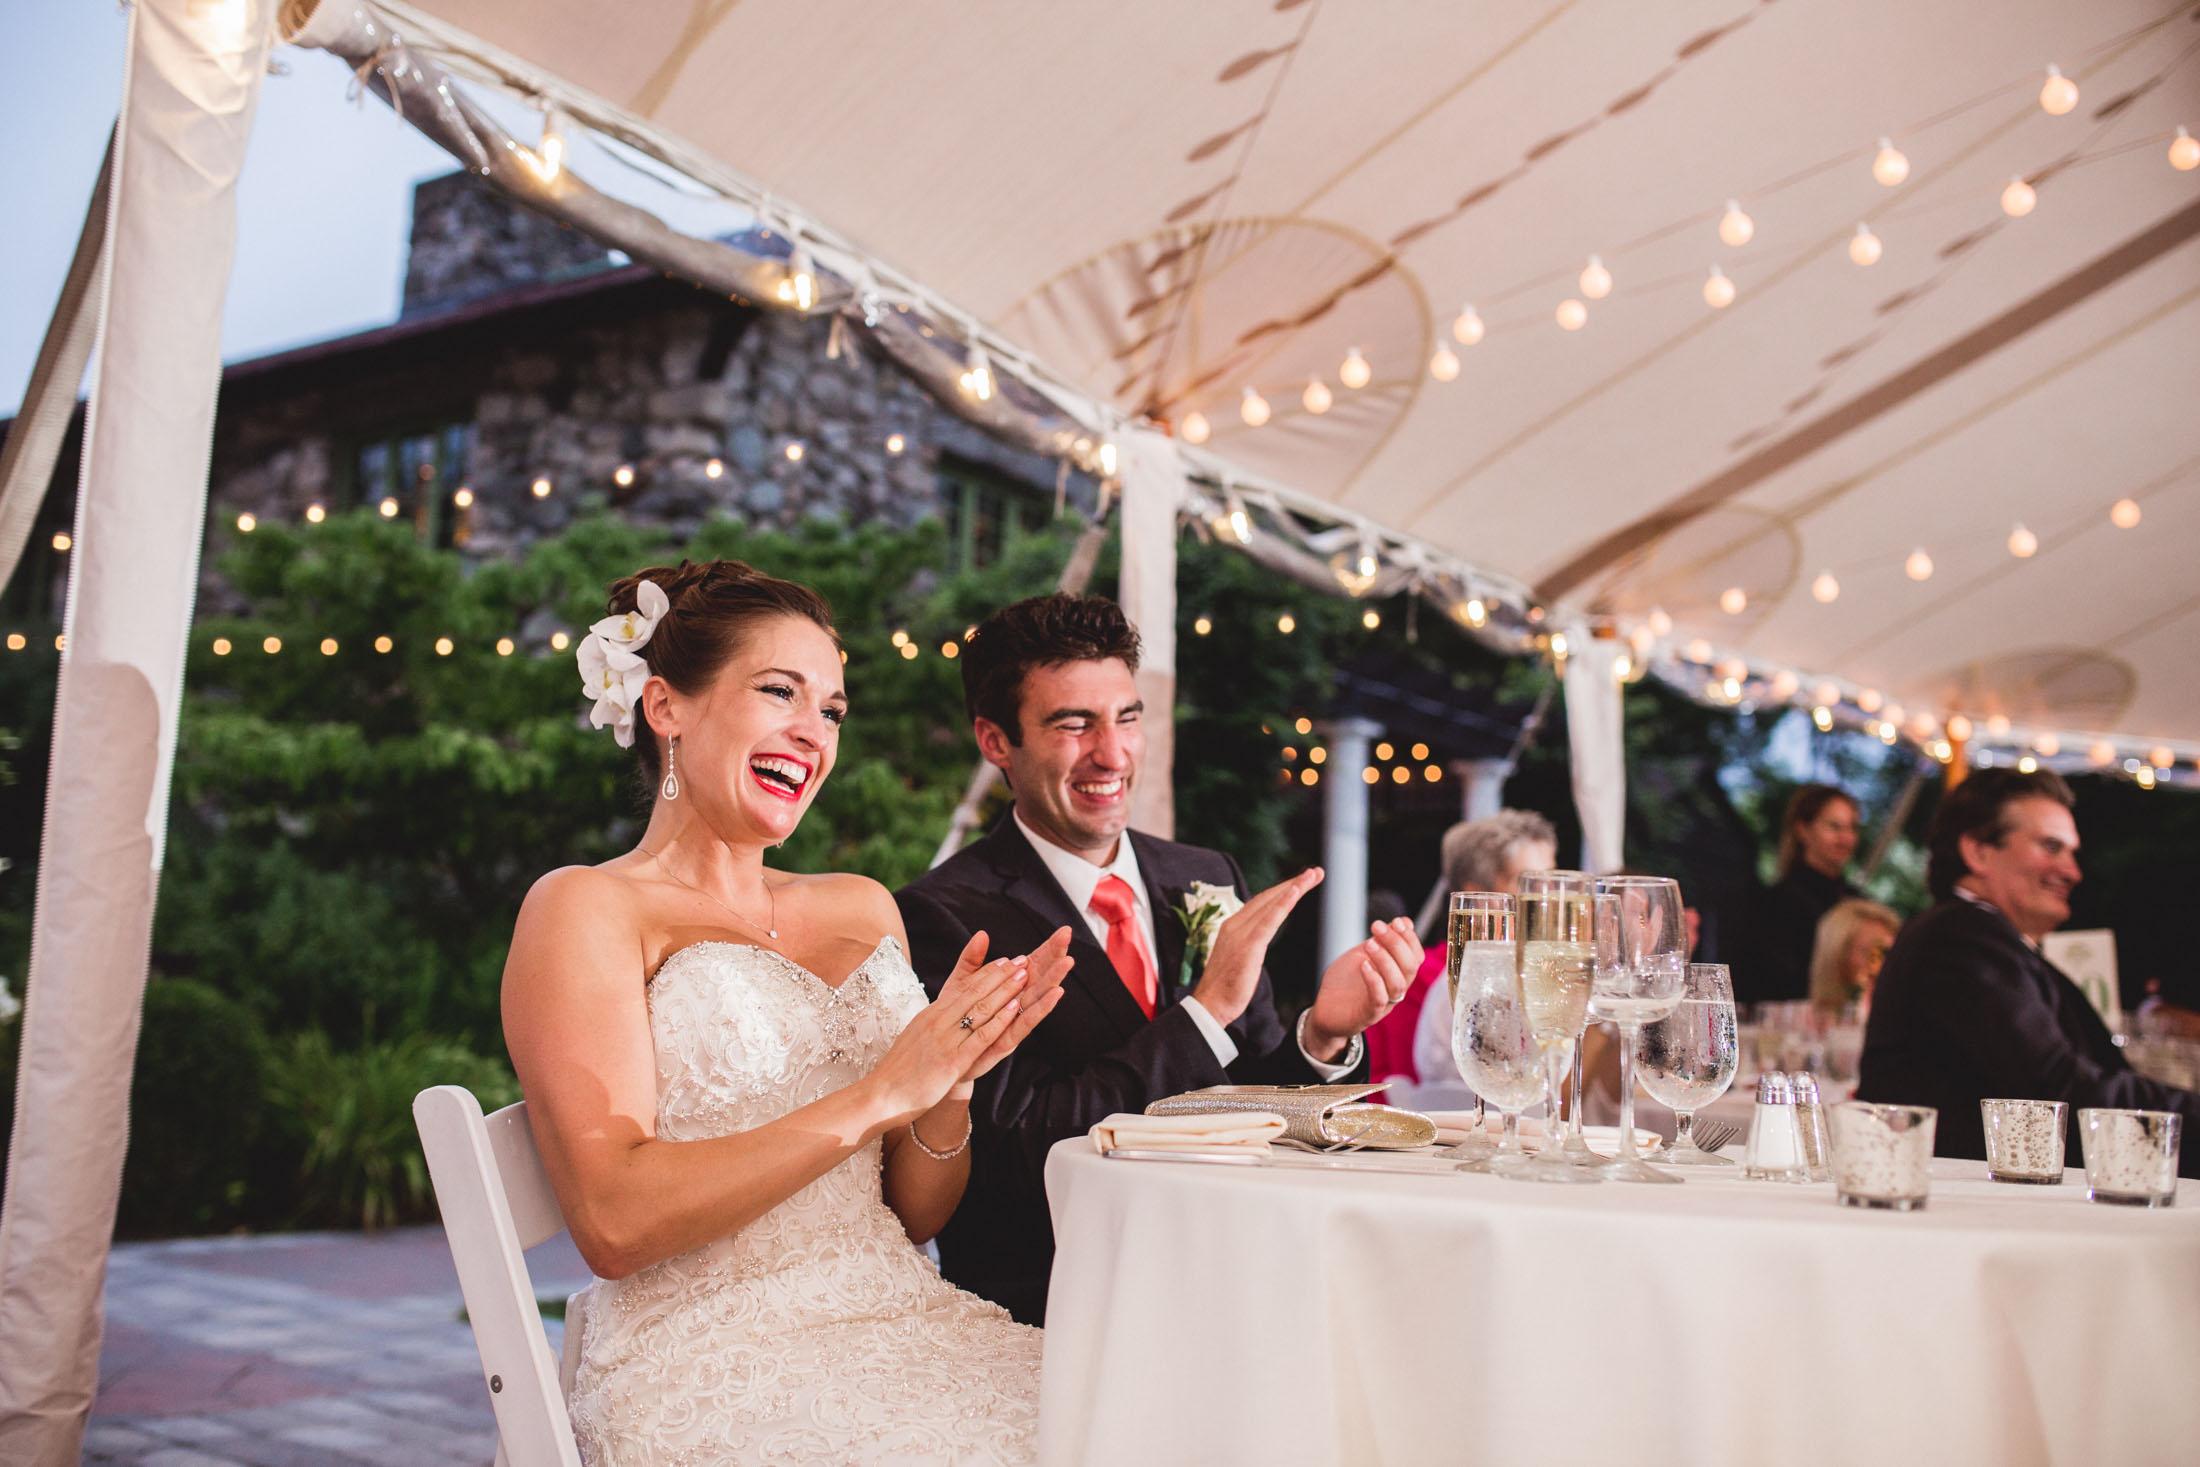 Willowdale-wedding-photography-33.jpg